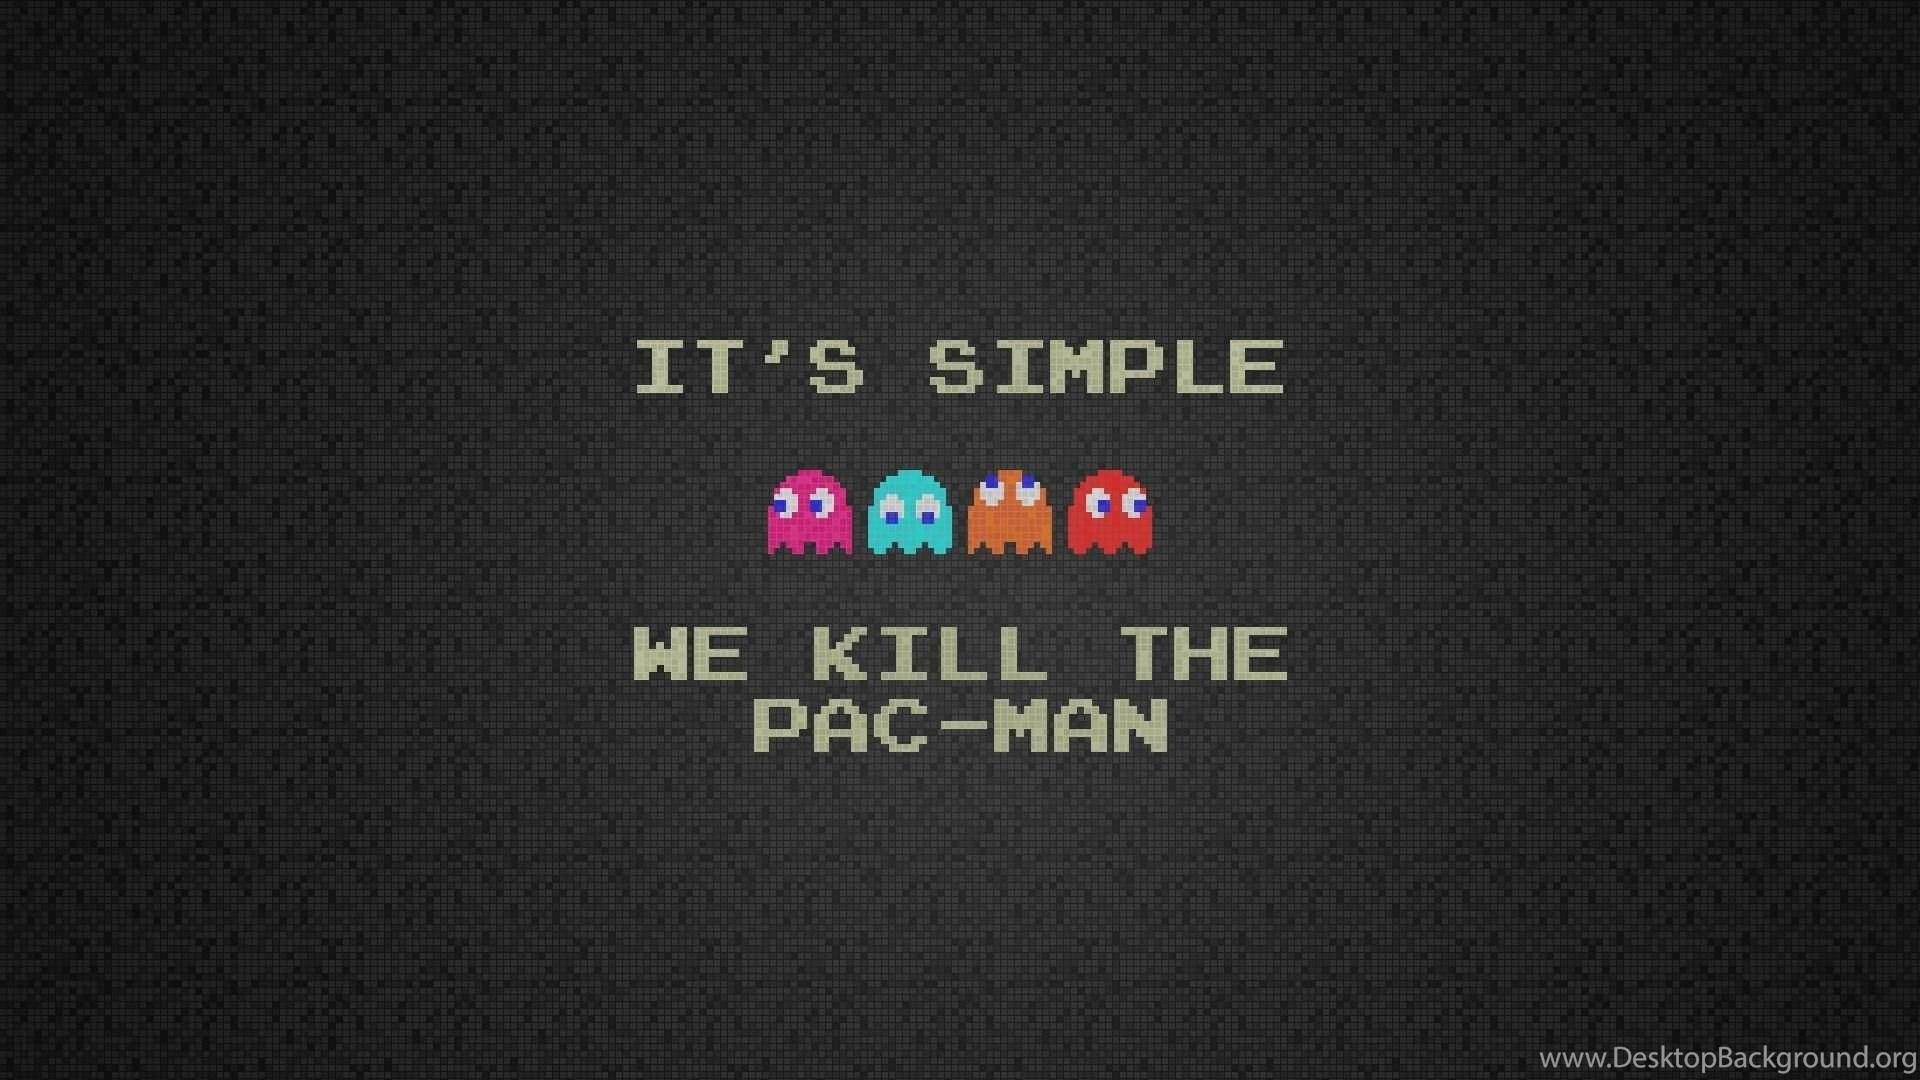 Video Game Quotes Wallpaper Quotesgram Desktop Background